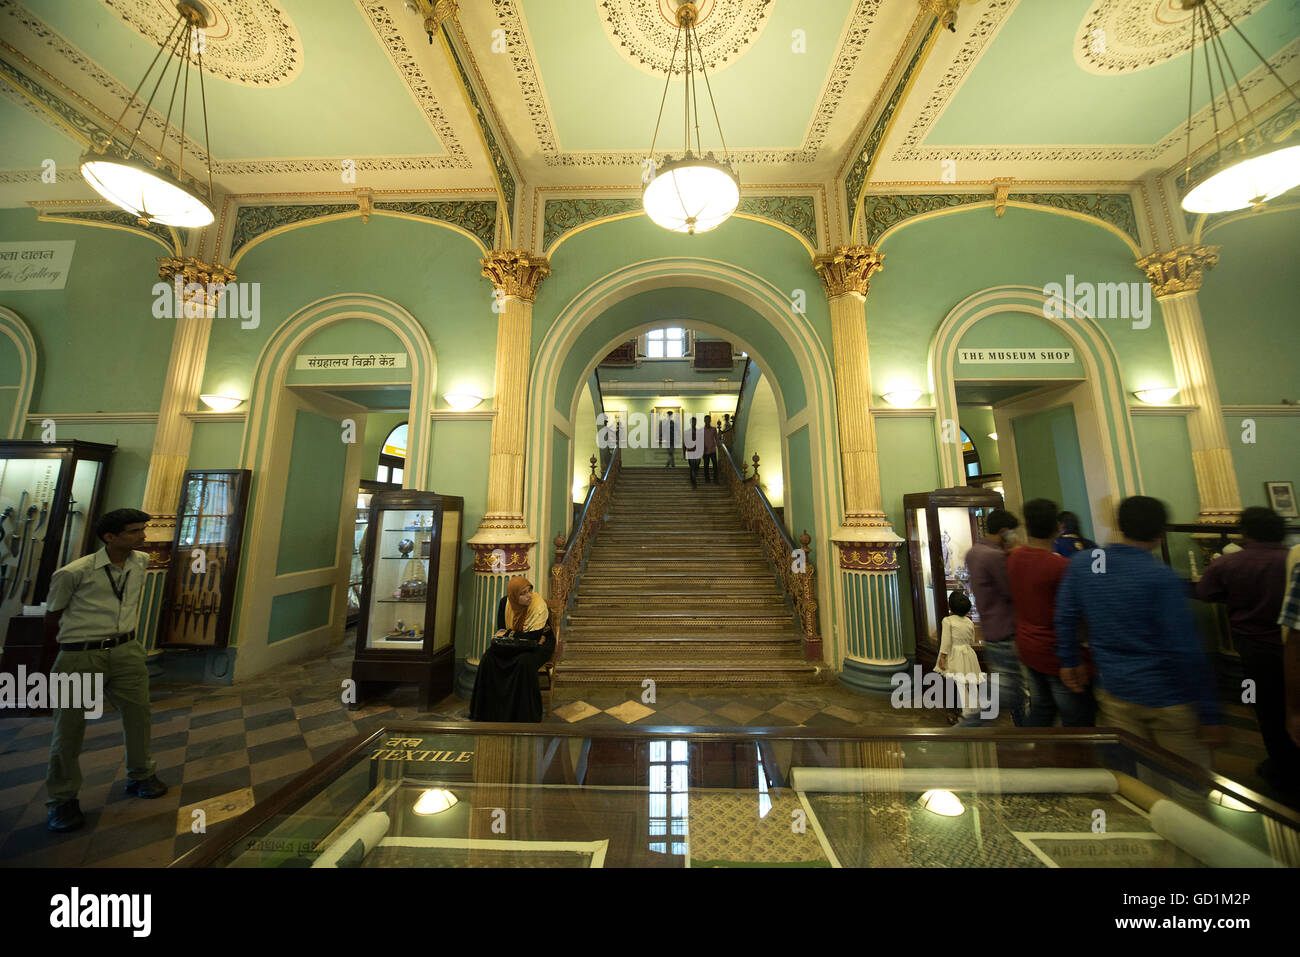 L'immagine di Bhau Daji Lad Museo fu preso in Mumbai, India Immagini Stock